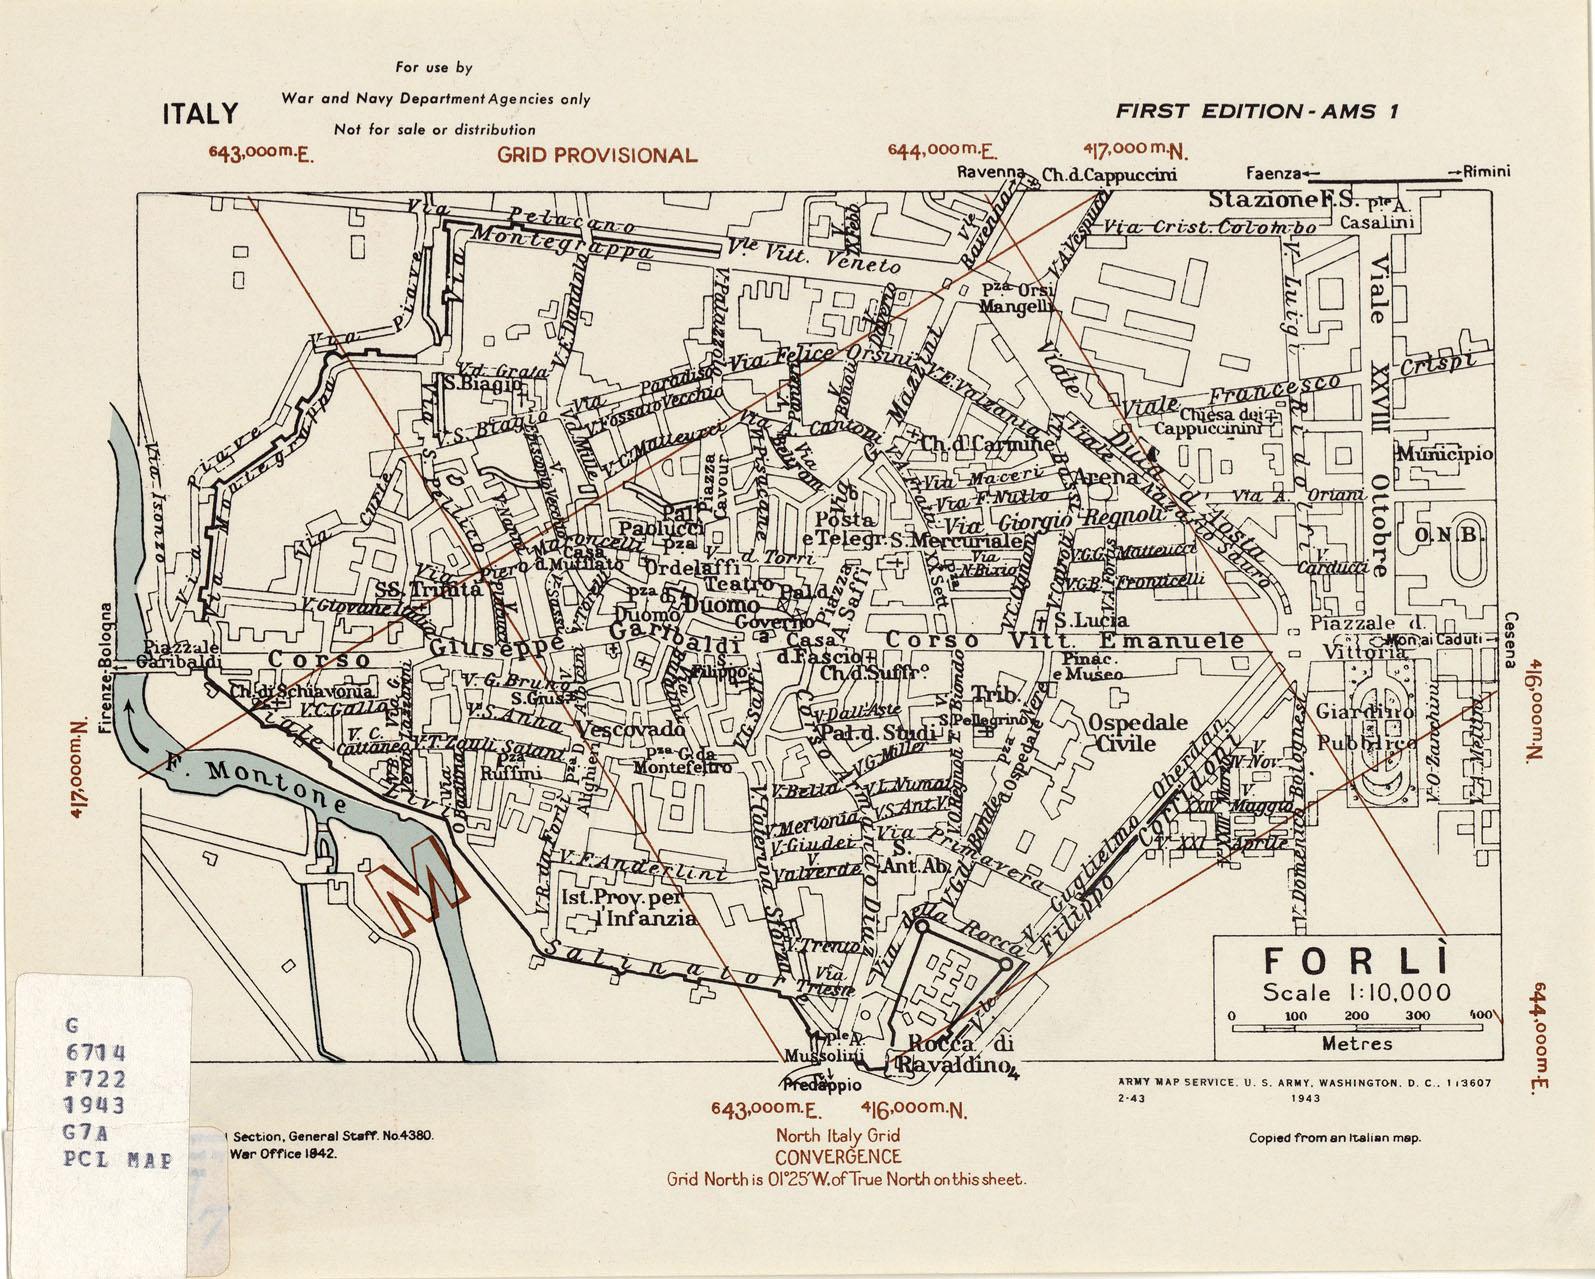 Forli Italy Map.Forli Italy Map